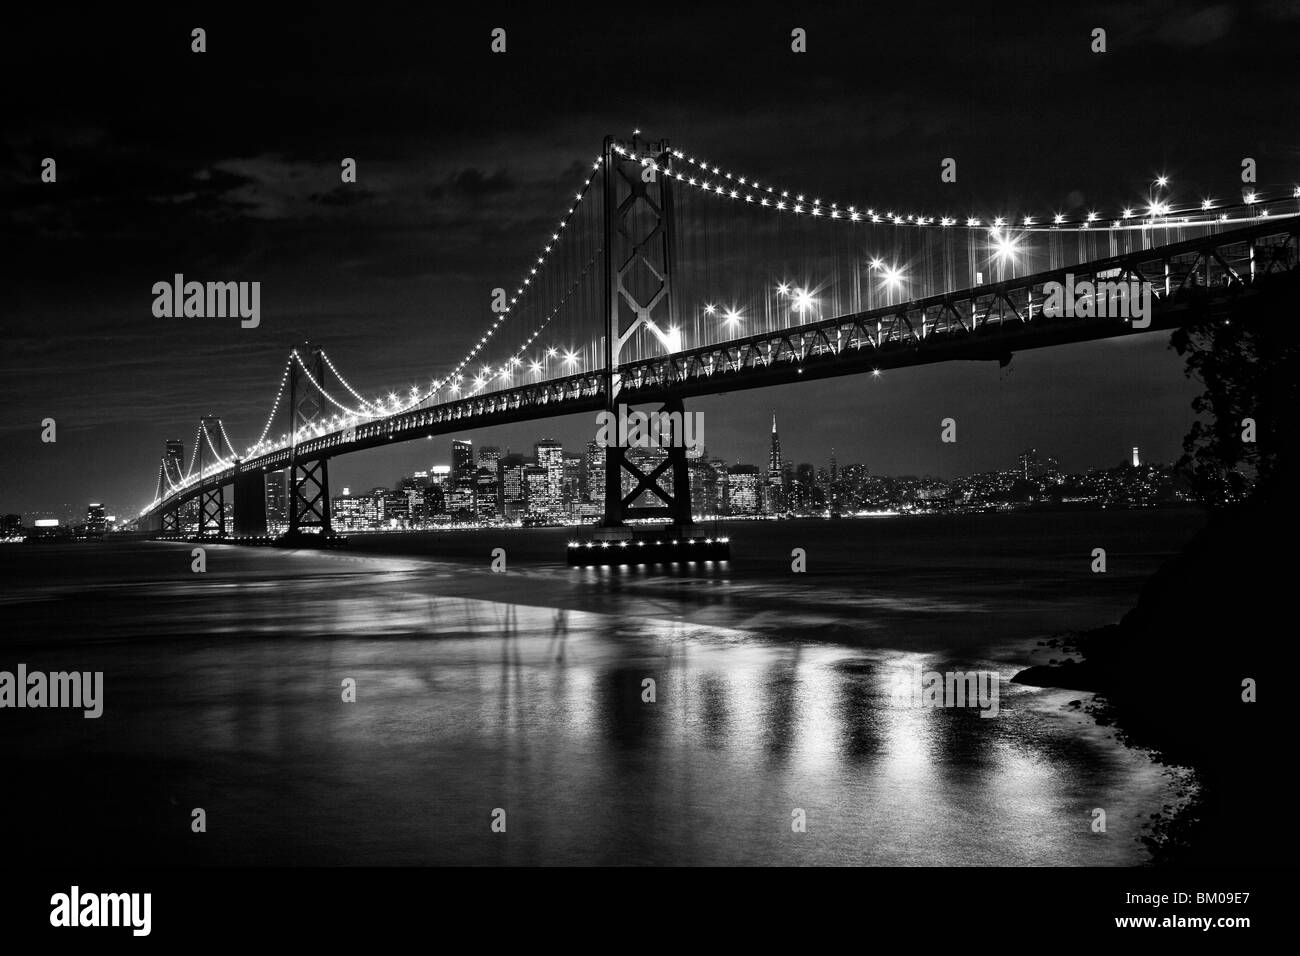 View of San Francisco and the Oakland Bay Bridge at night - Stock Image